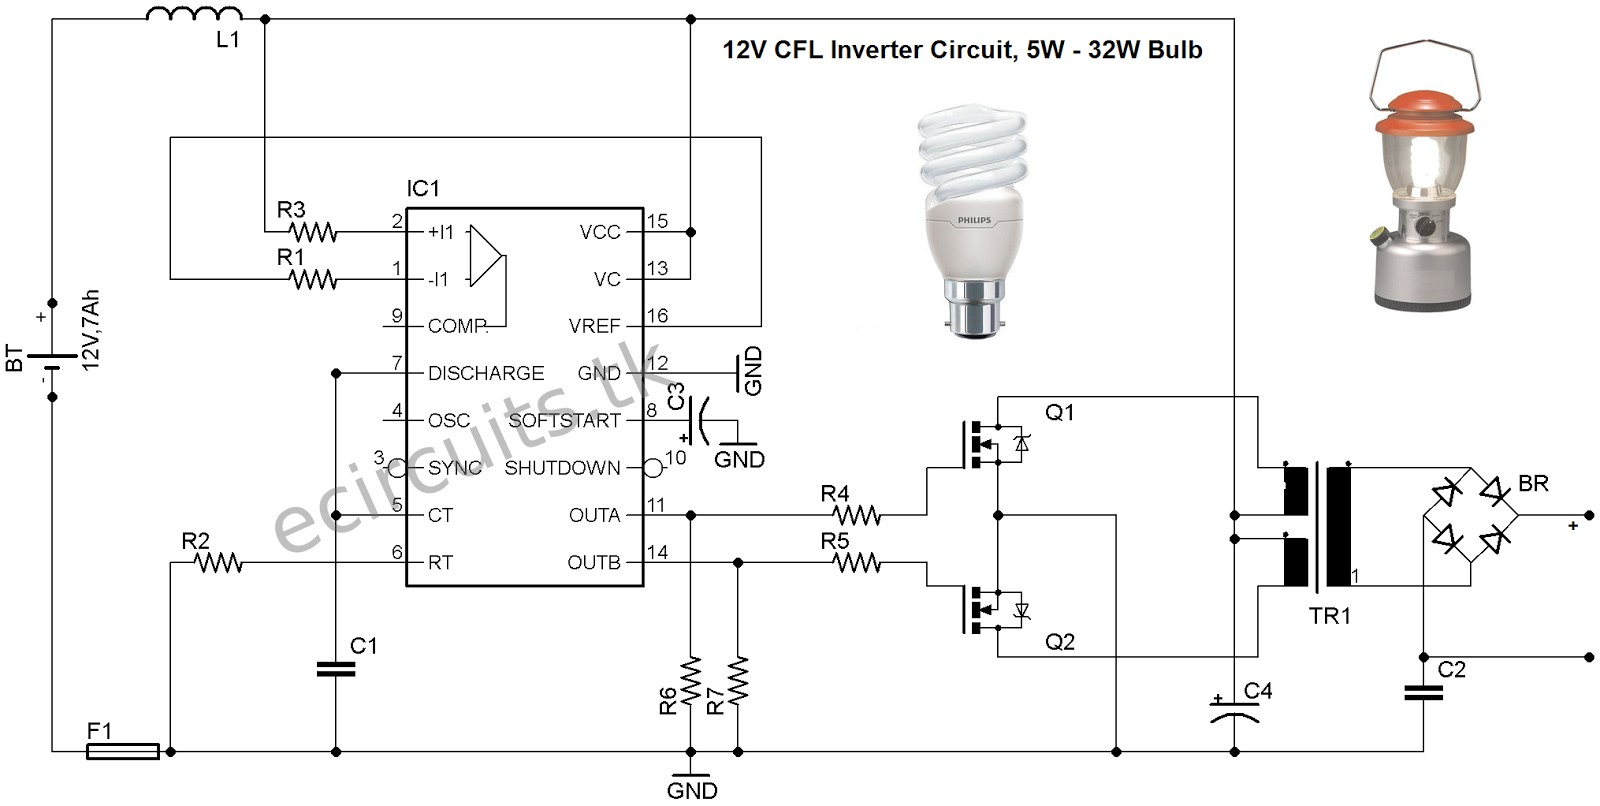 philips energy saver circuit diagram circuit and schematics diagram rh wiringdiagram karaharmsphotography com